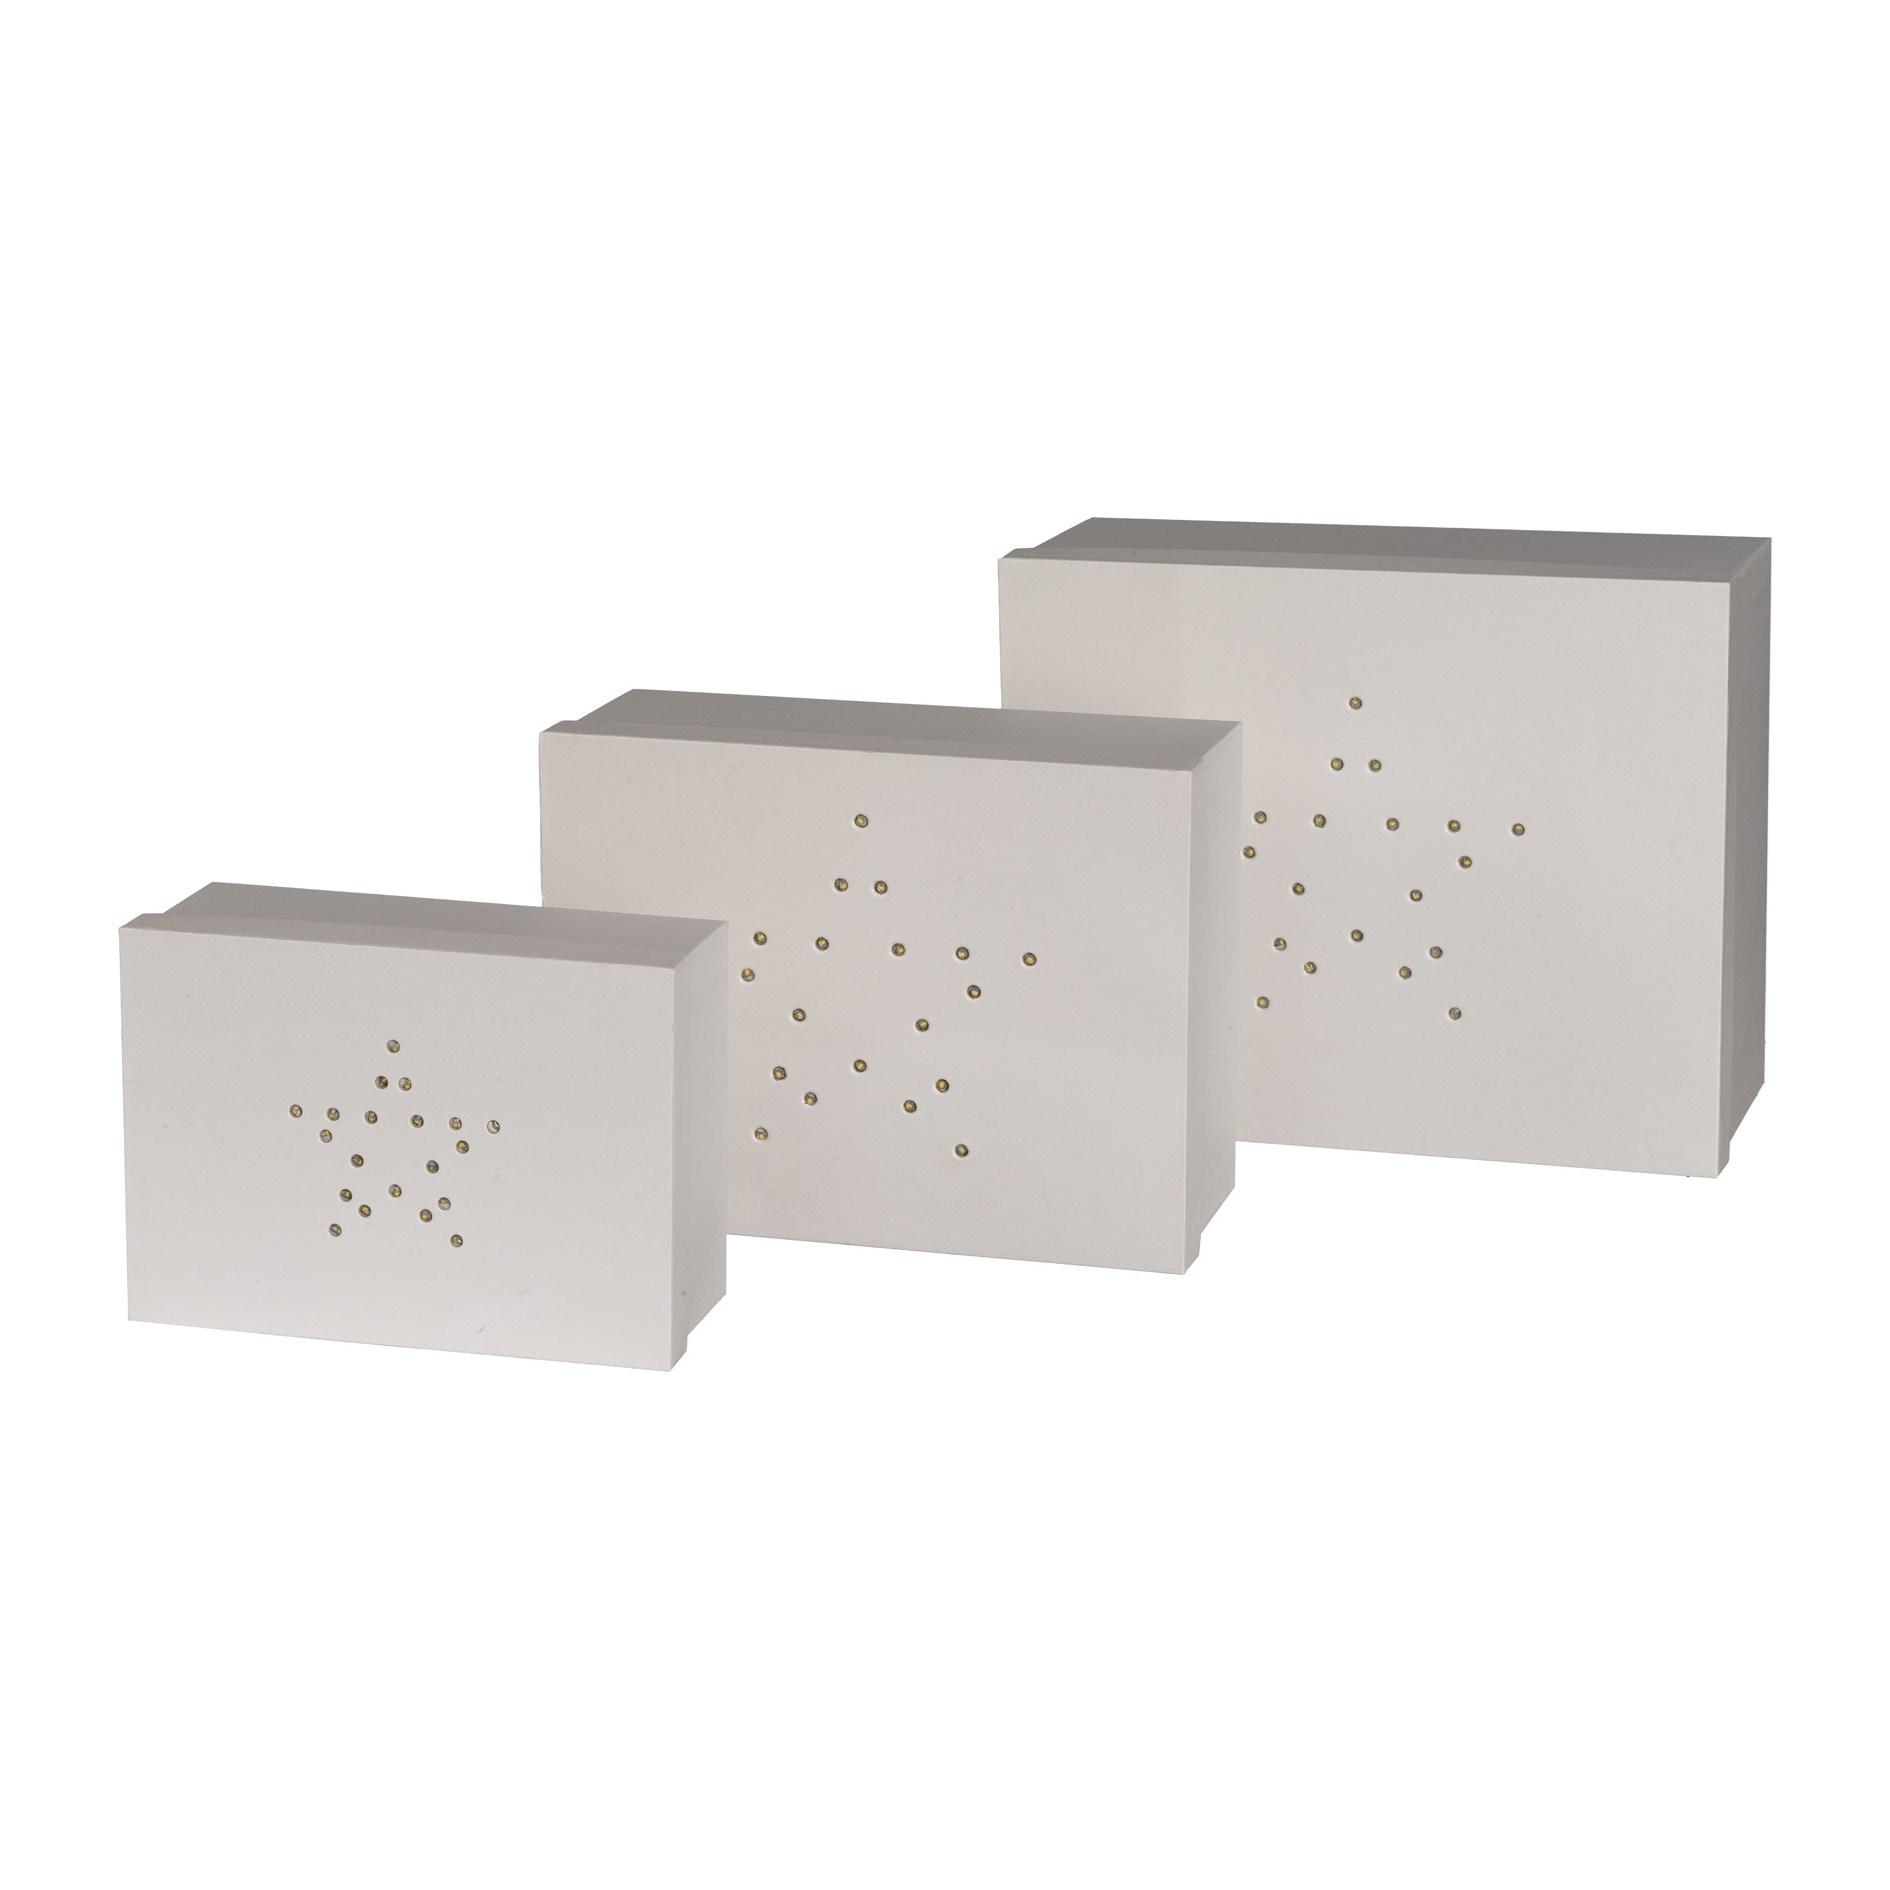 Geschenkbox rechteckig m.LED 3er Set Ste_0